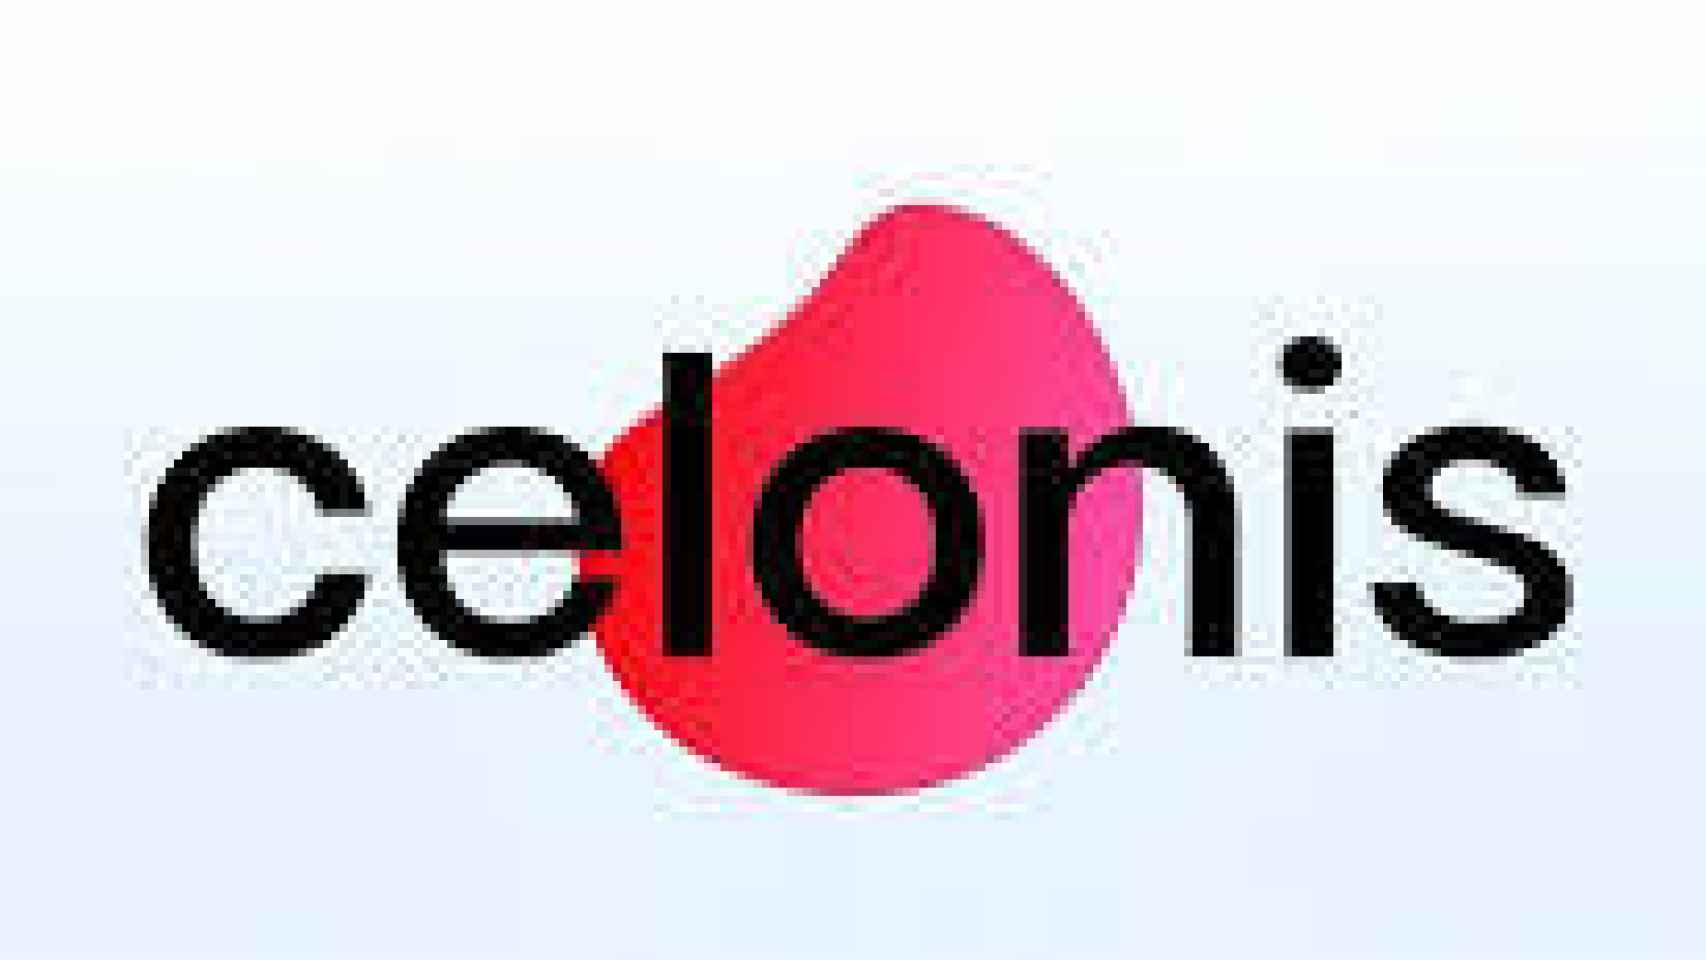 Celonis llega a Españacon un centro de negocios en Madrid que creará 250 empleos